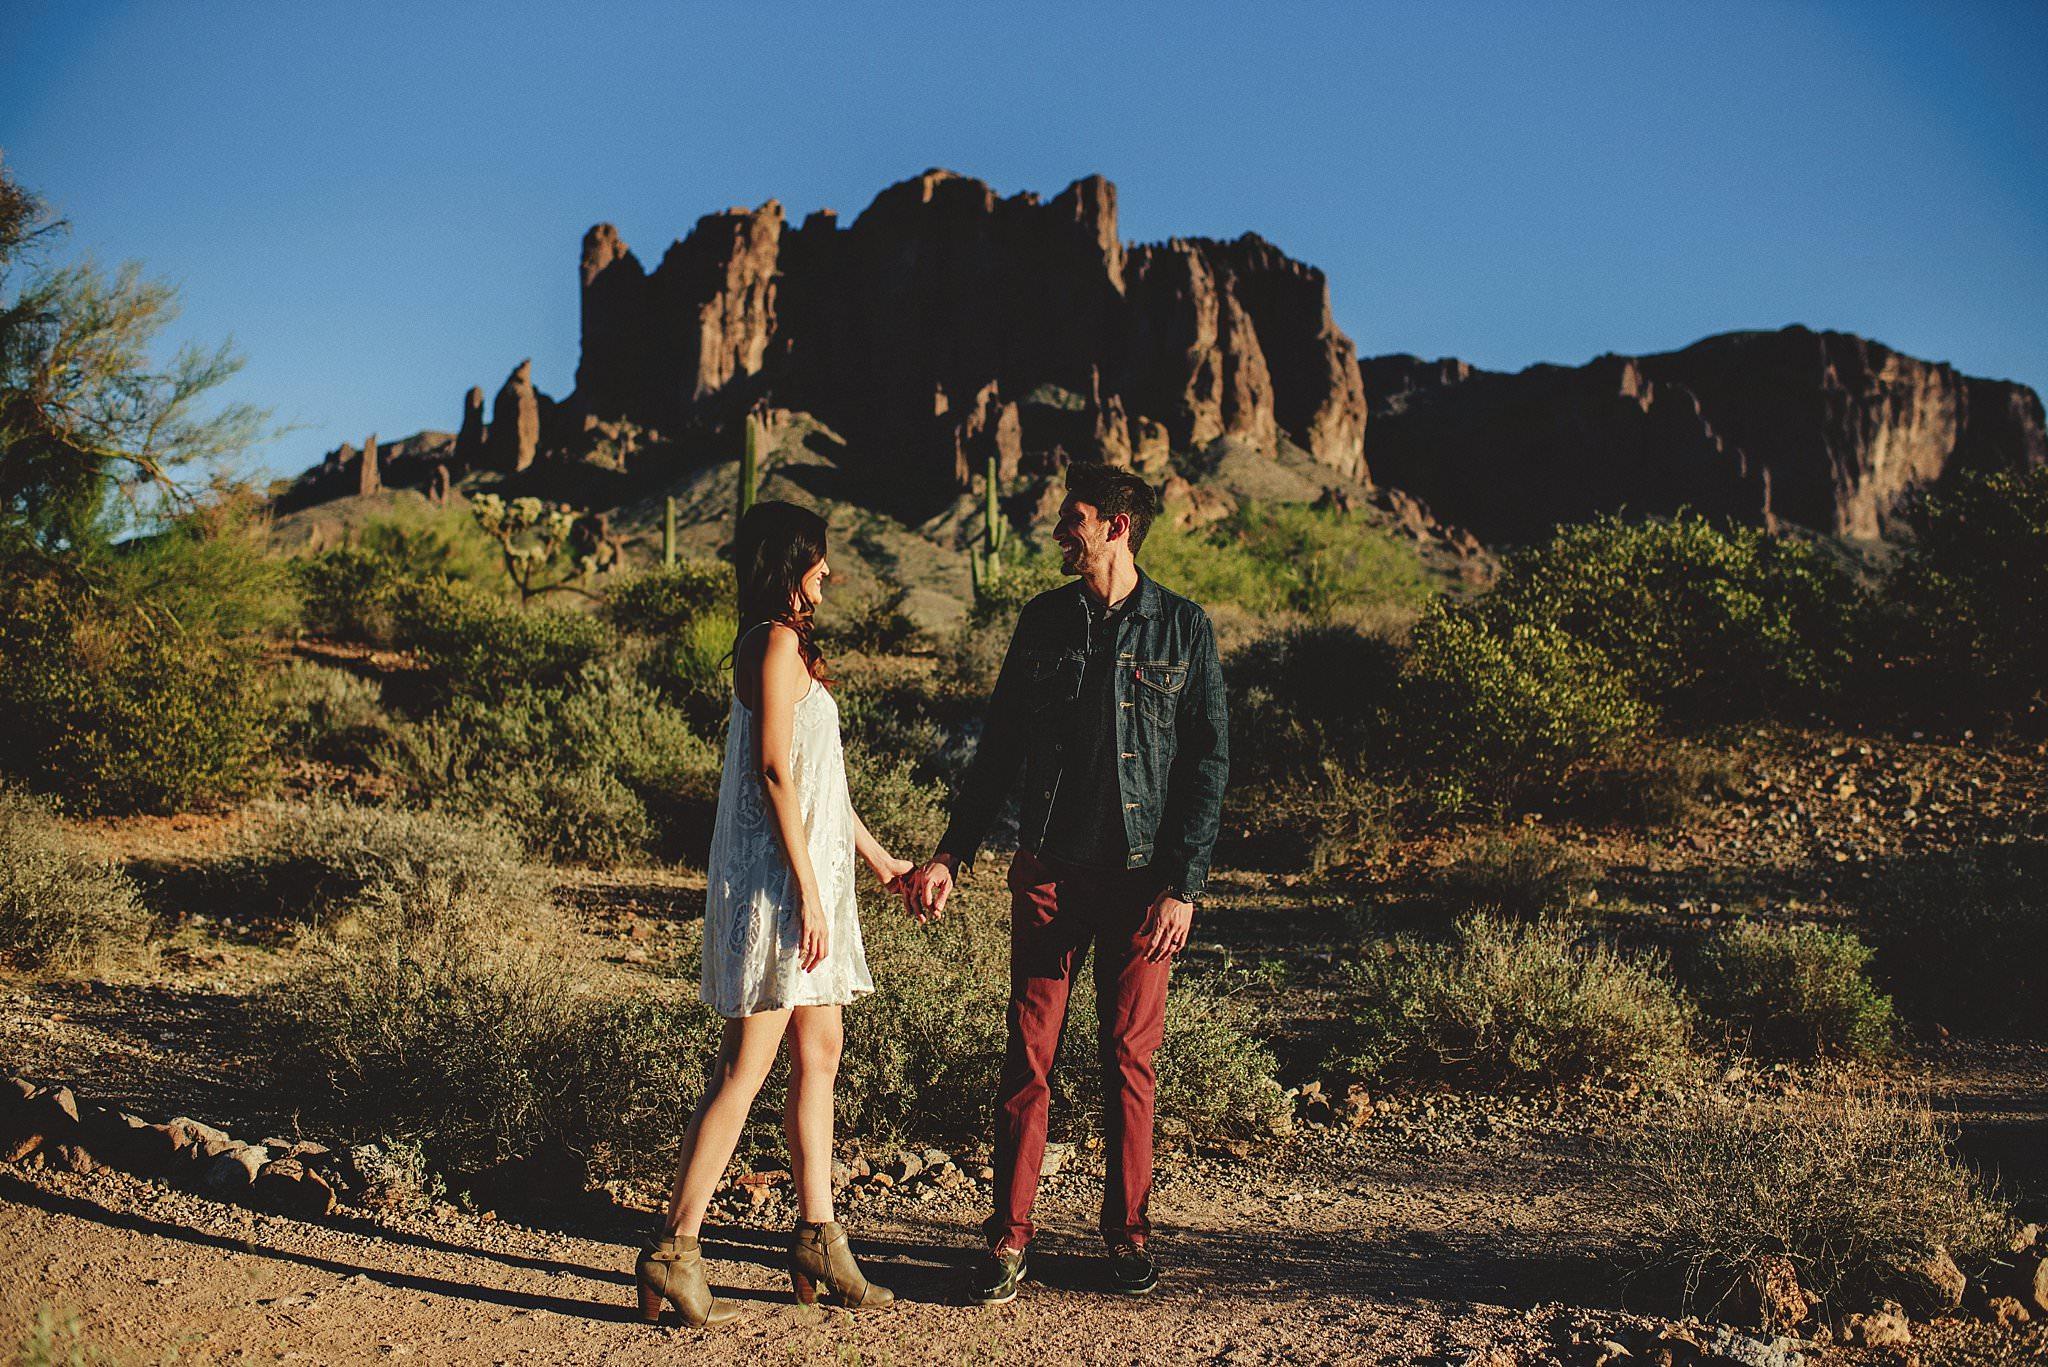 superstition-mountains-desert-engagement-photos-0005.jpg